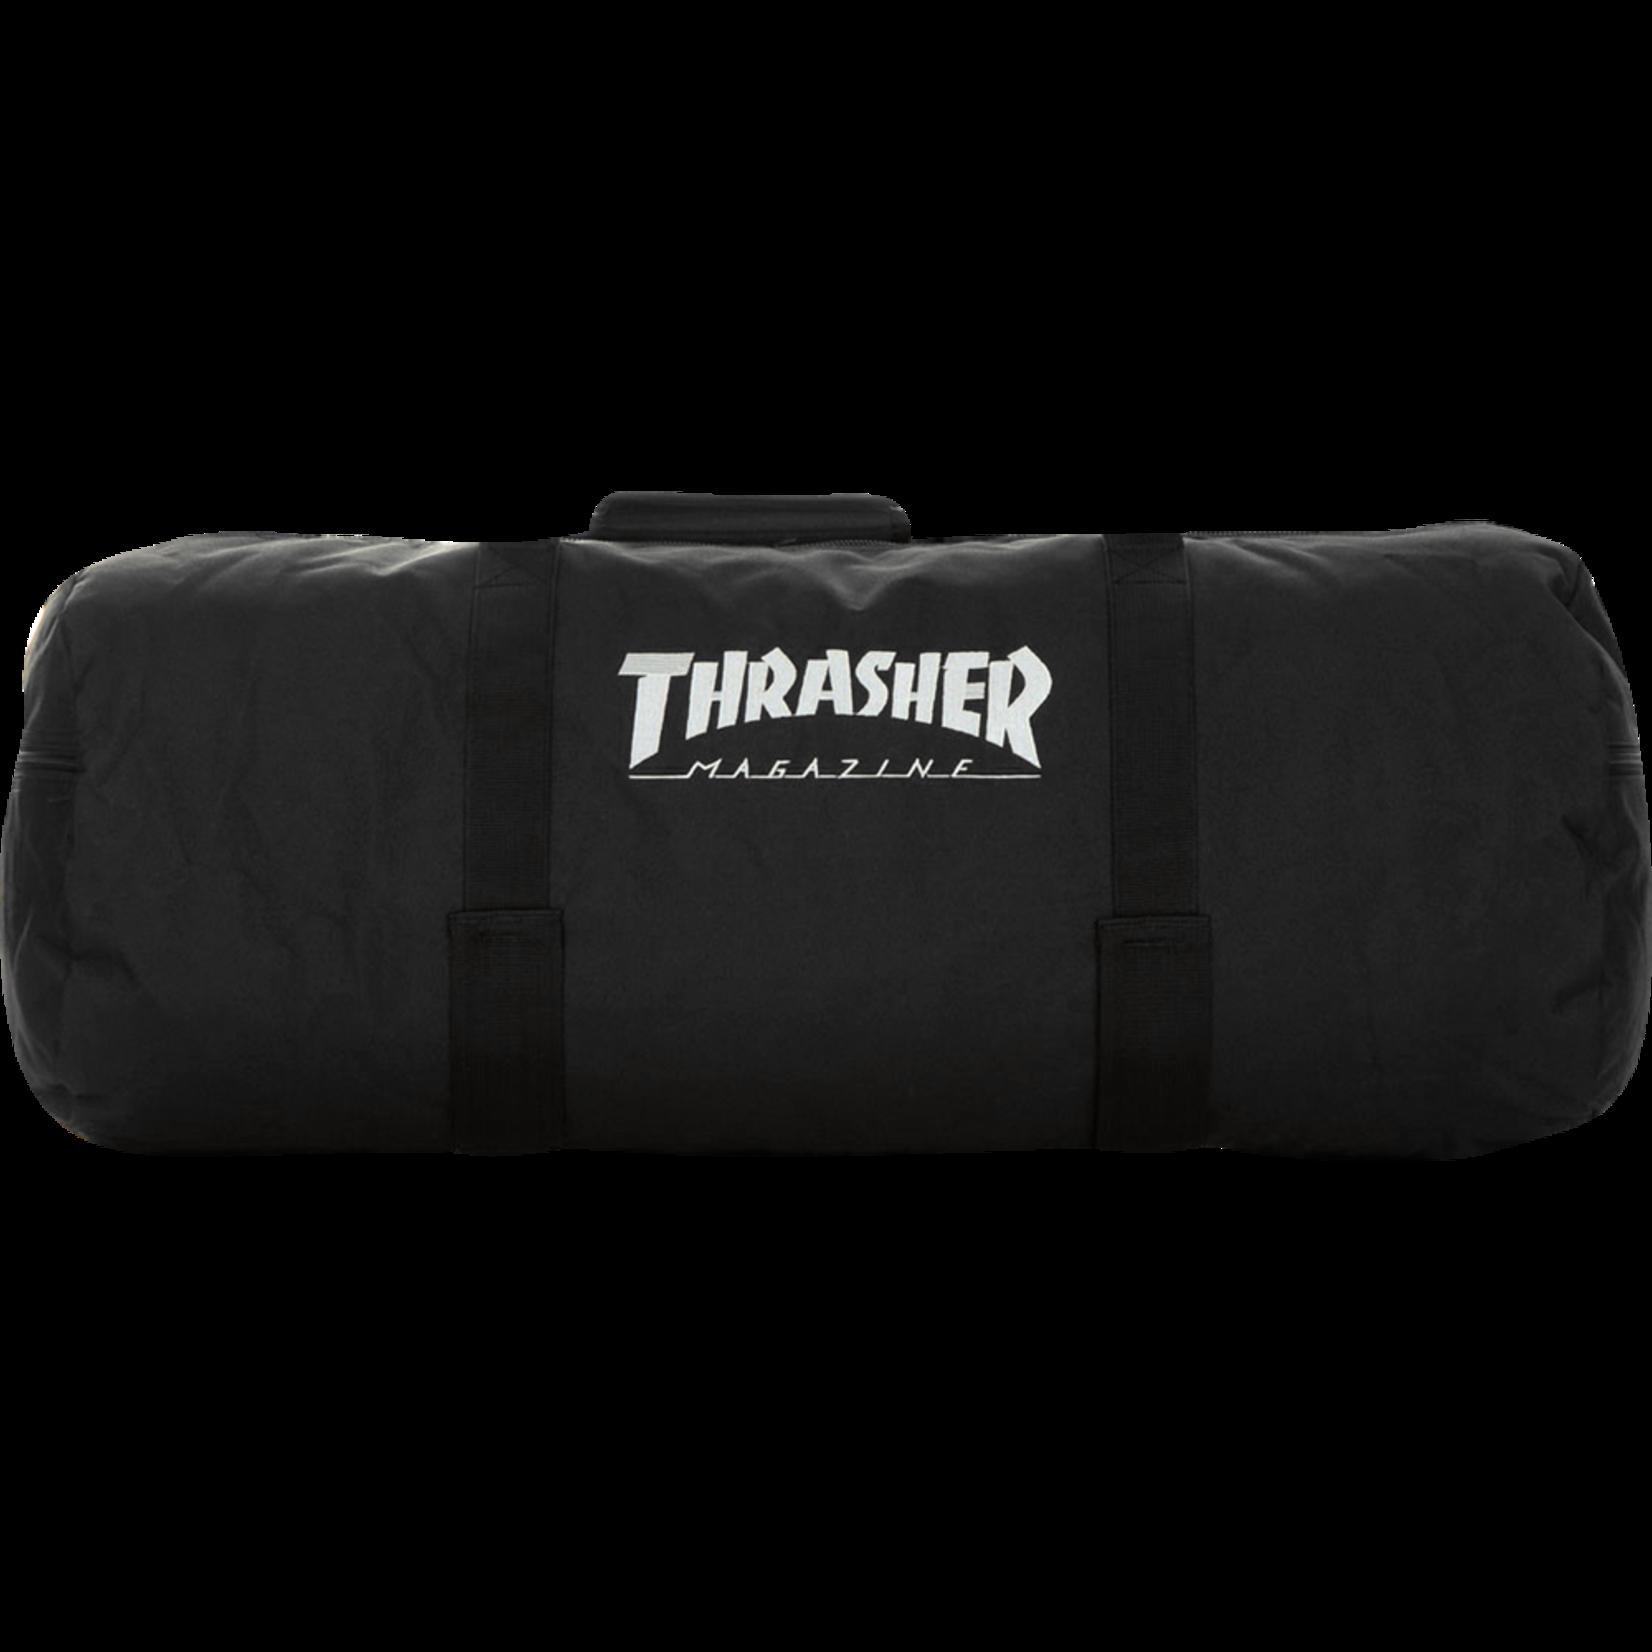 Thrasher Logo Duffel Bag, Black,